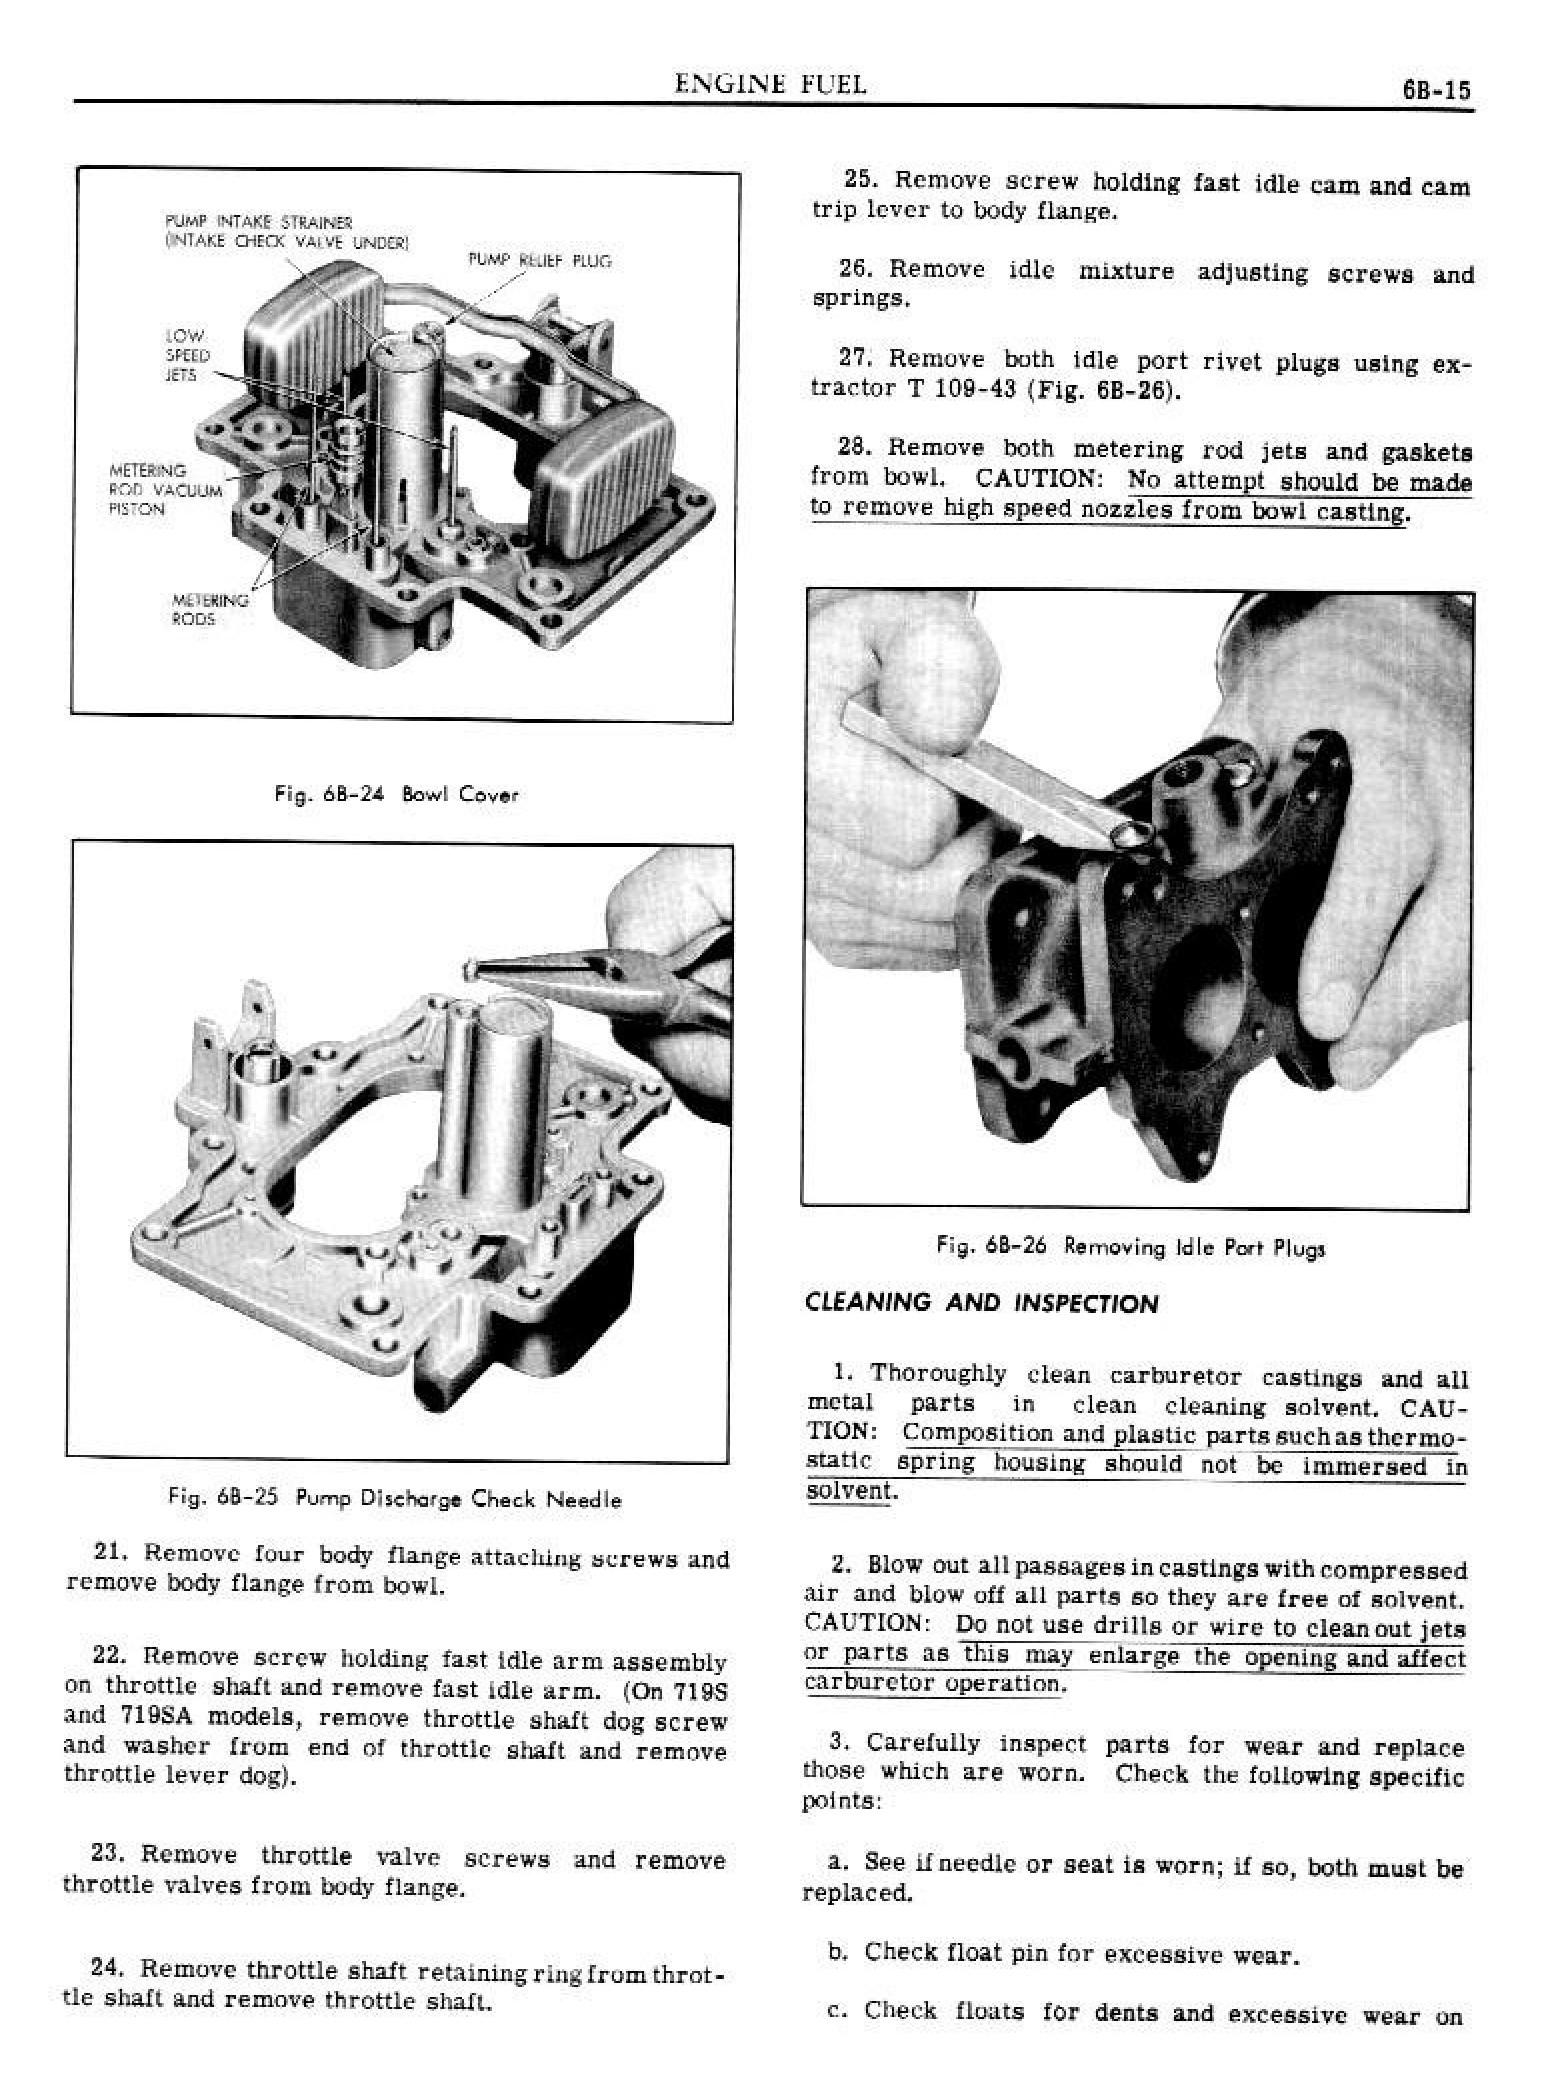 1949 Pontiac Shop Manual- Engine Fuel Page 15 of 42